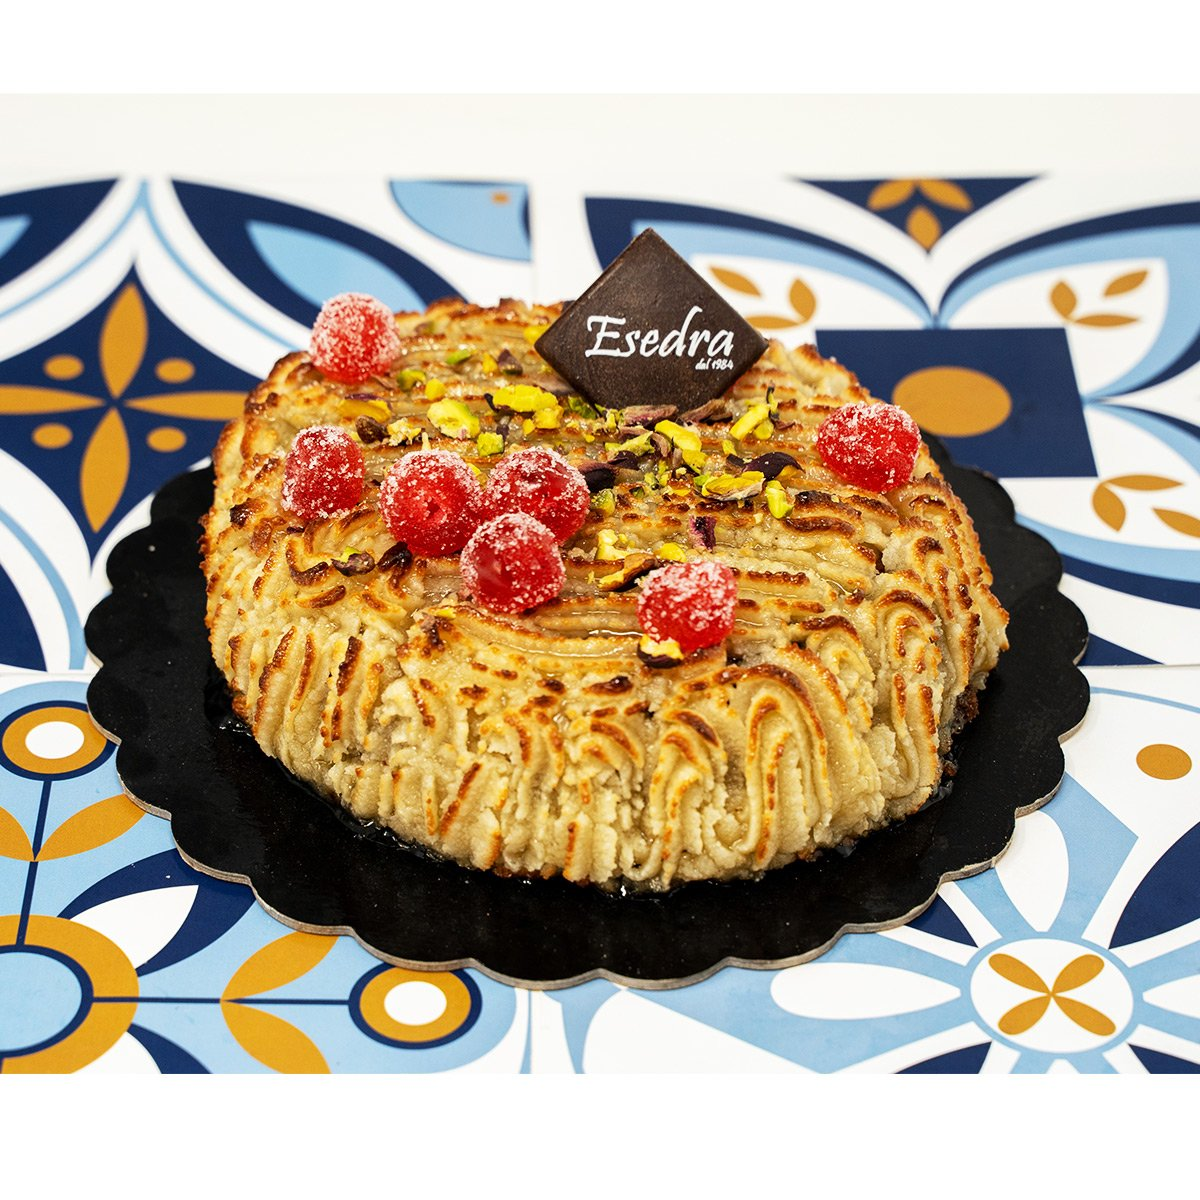 Torta Delizia01 -Pasticceria Esedra